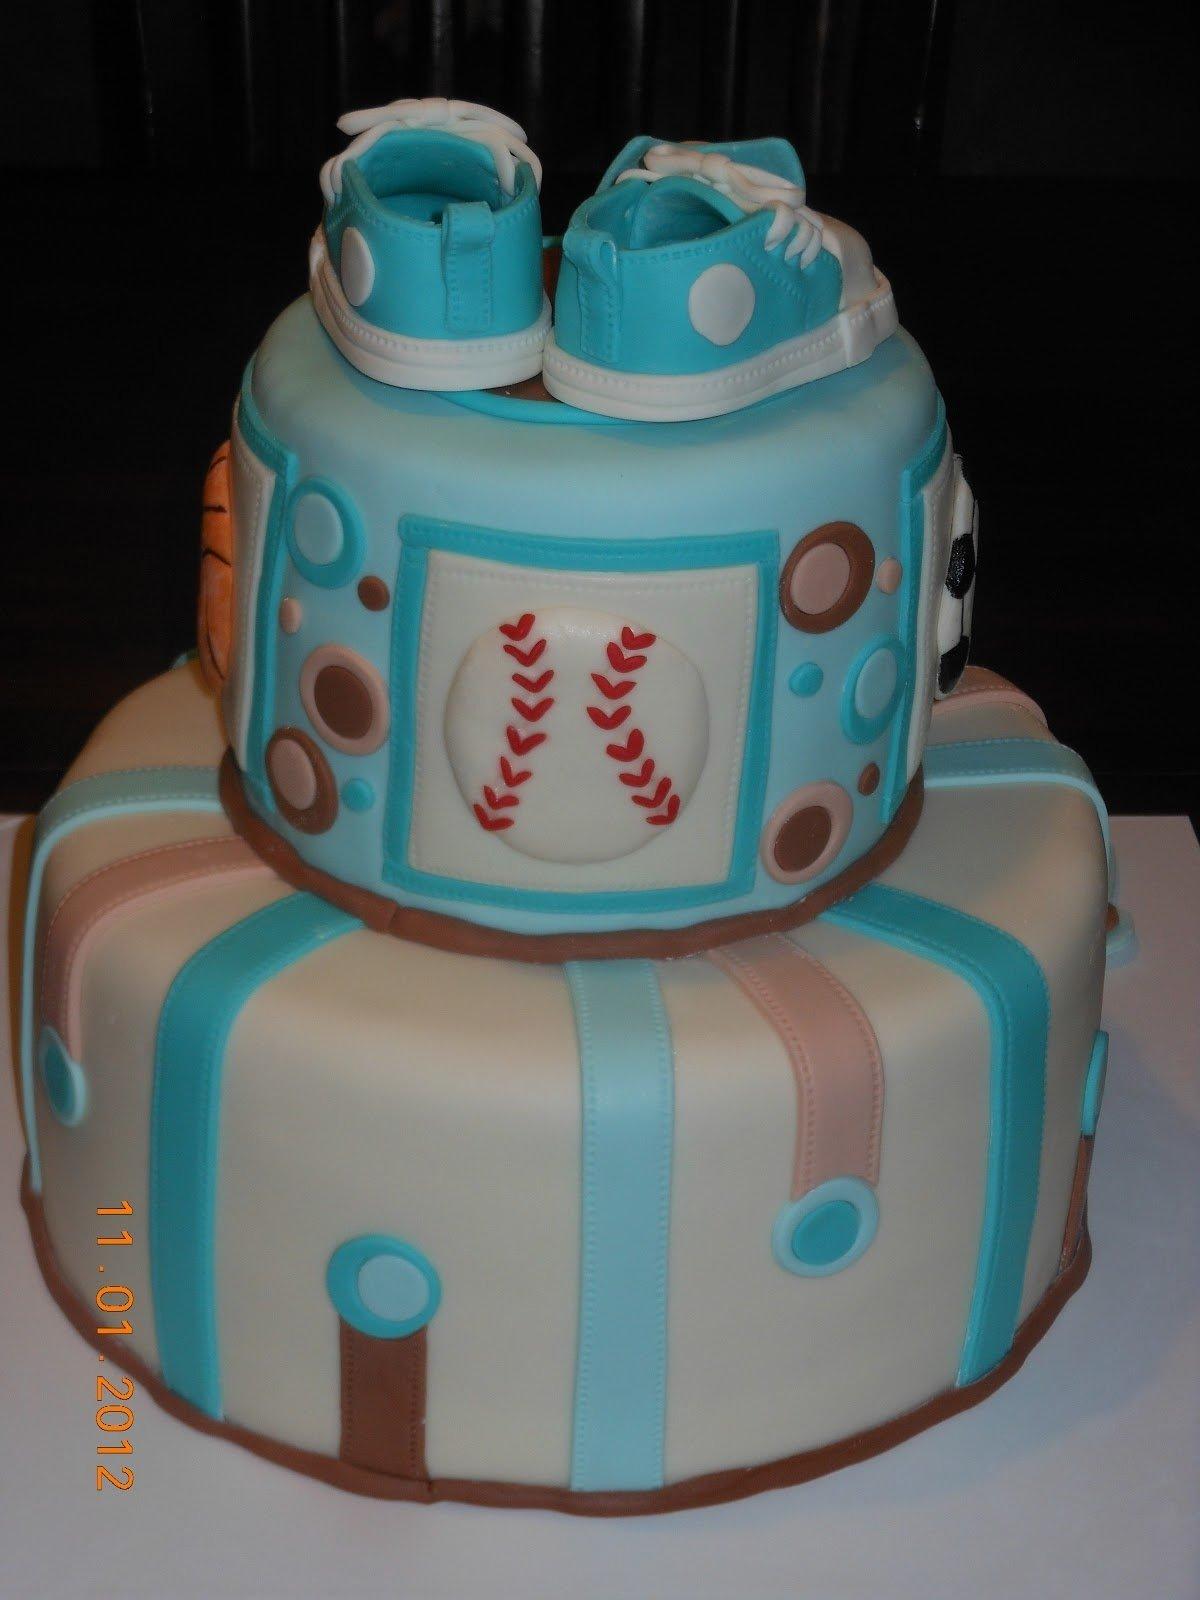 10 Stunning Baby Boy Baby Shower Cake Ideas baby shower cake ideas from walmart elegant its a piece of cake 2020